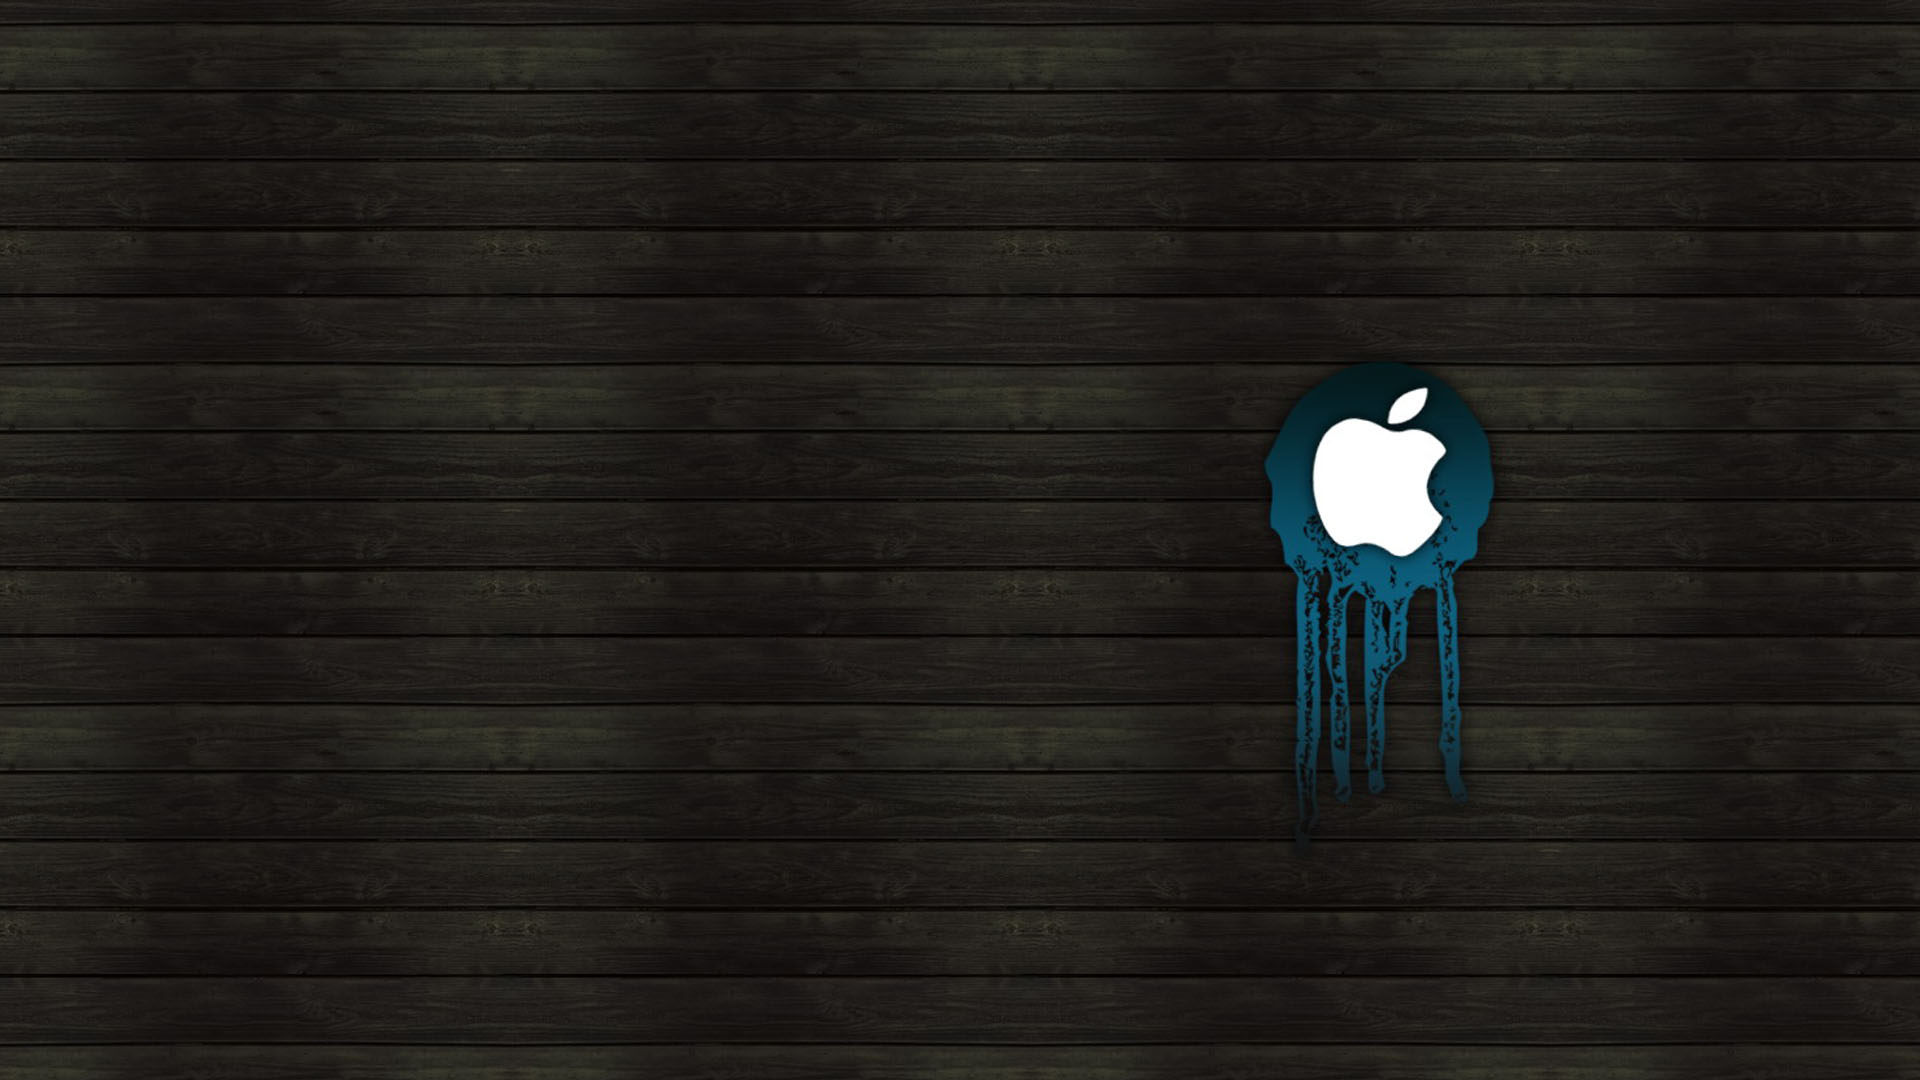 Hipster Quotes Wallpaper Iphone Hd Macbook Air Logo Wallpapers Pixelstalk Net